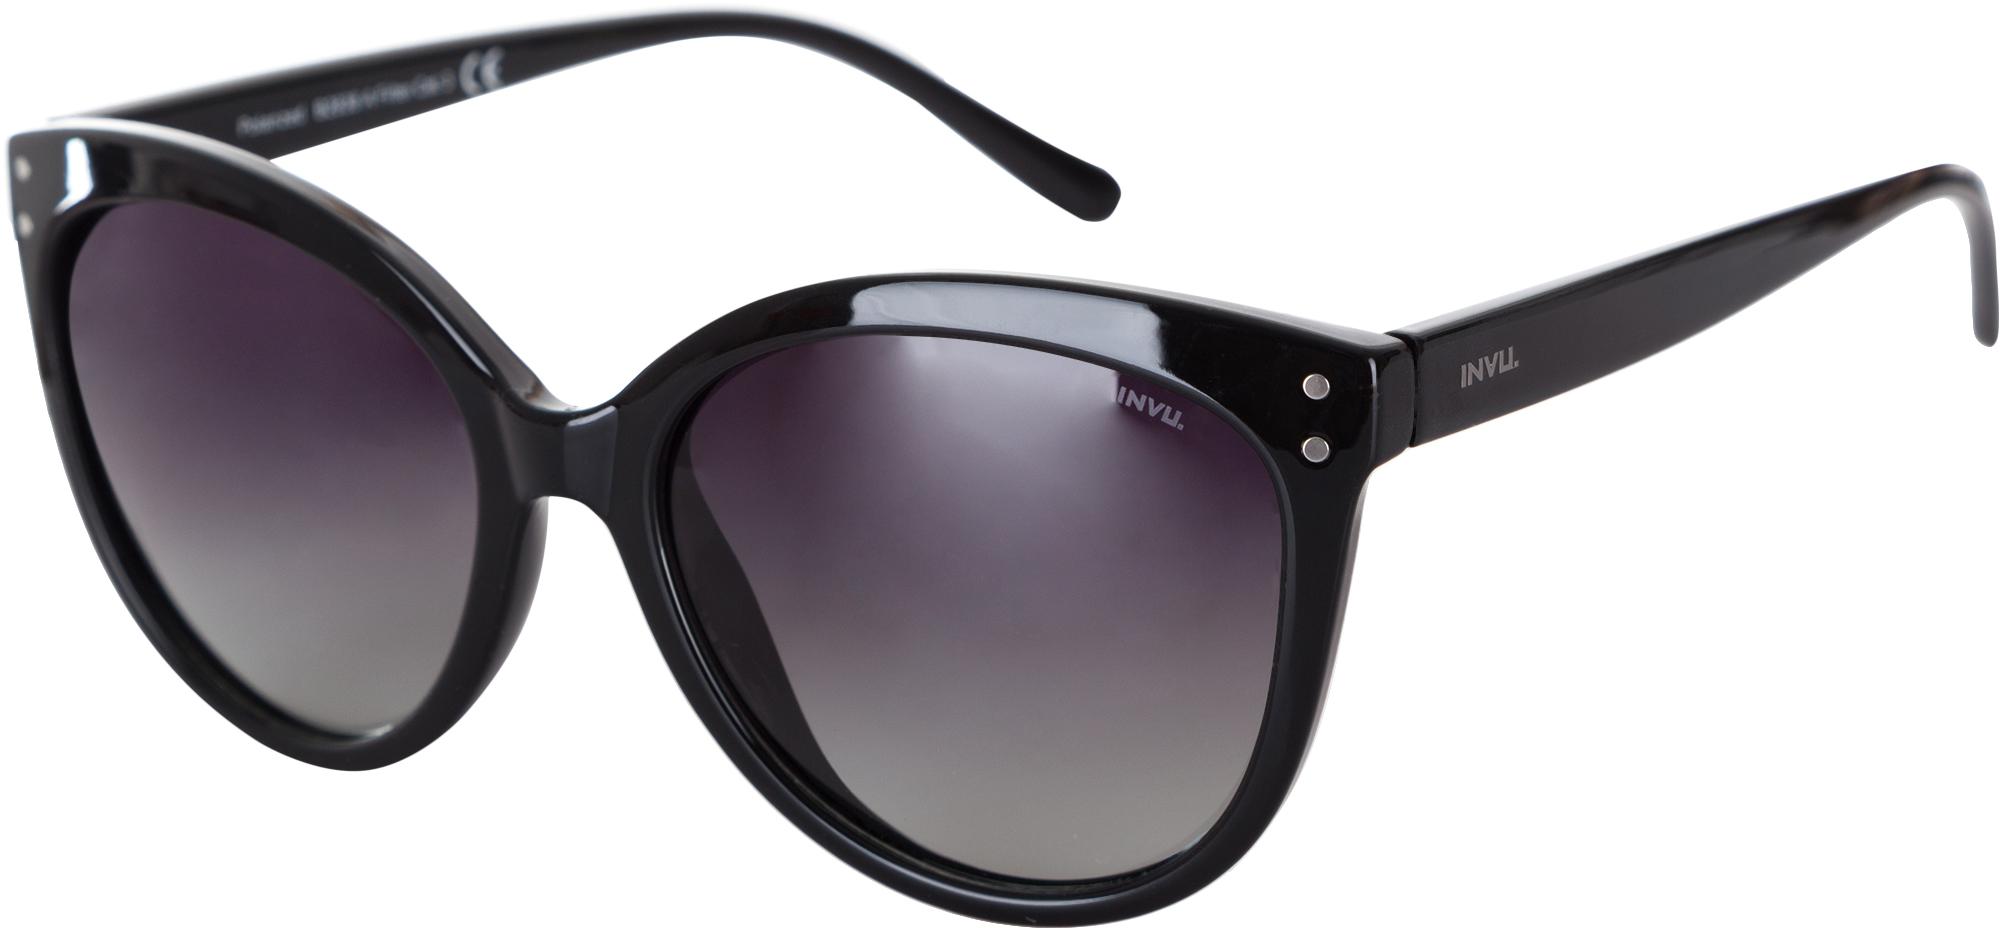 Invu Солнцезащитные очки женские Invu солнцезащитные очки vivienne westwood солнцезащитные очки vw 907s 02